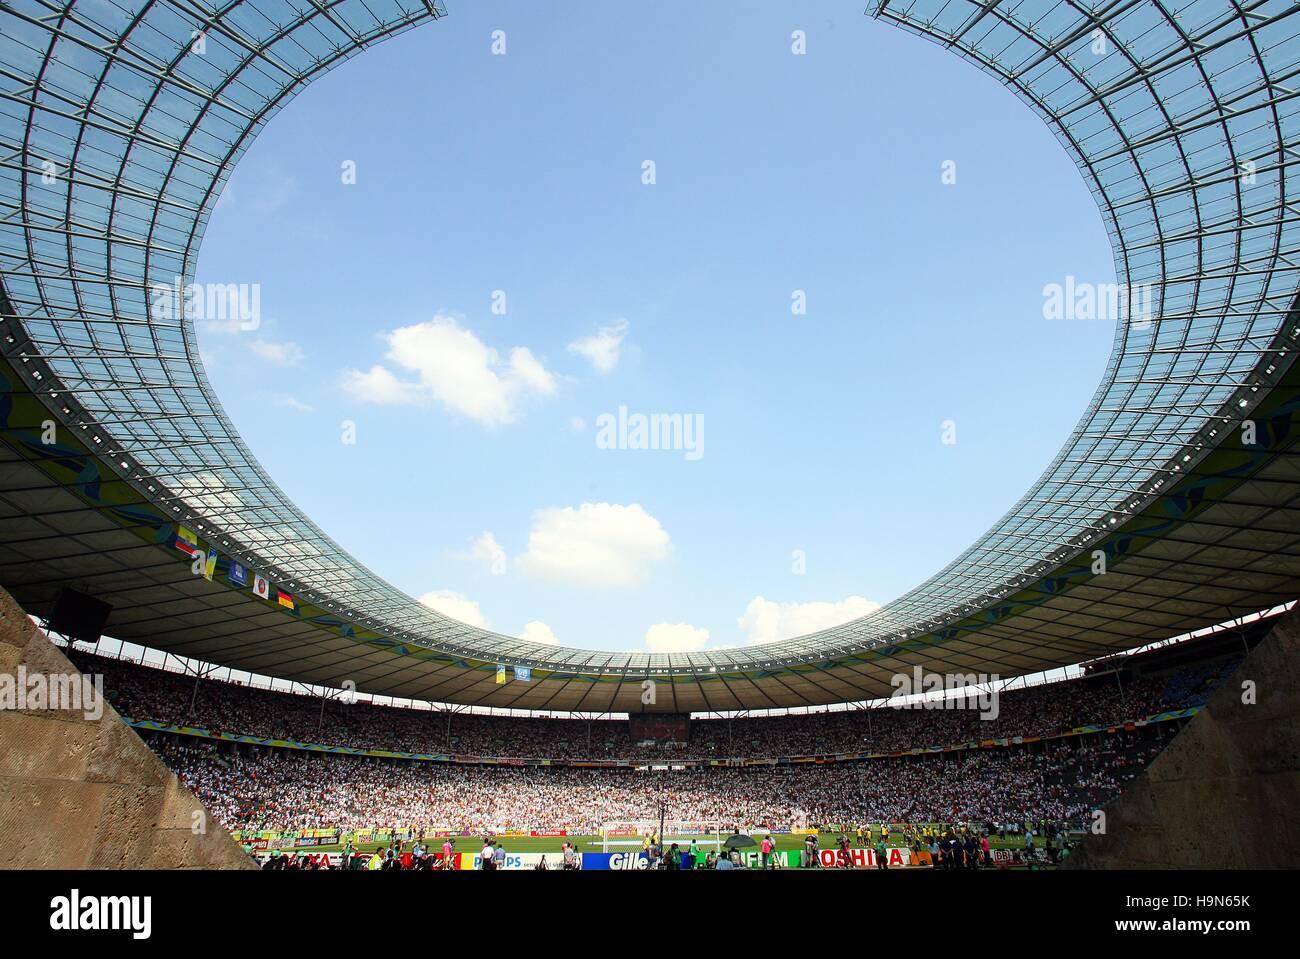 OLYMPIASTADION BERLIN ECUADOR V GERMANY WORLD CUP BERLIN GERMANY 20 June 2006 - Stock Image